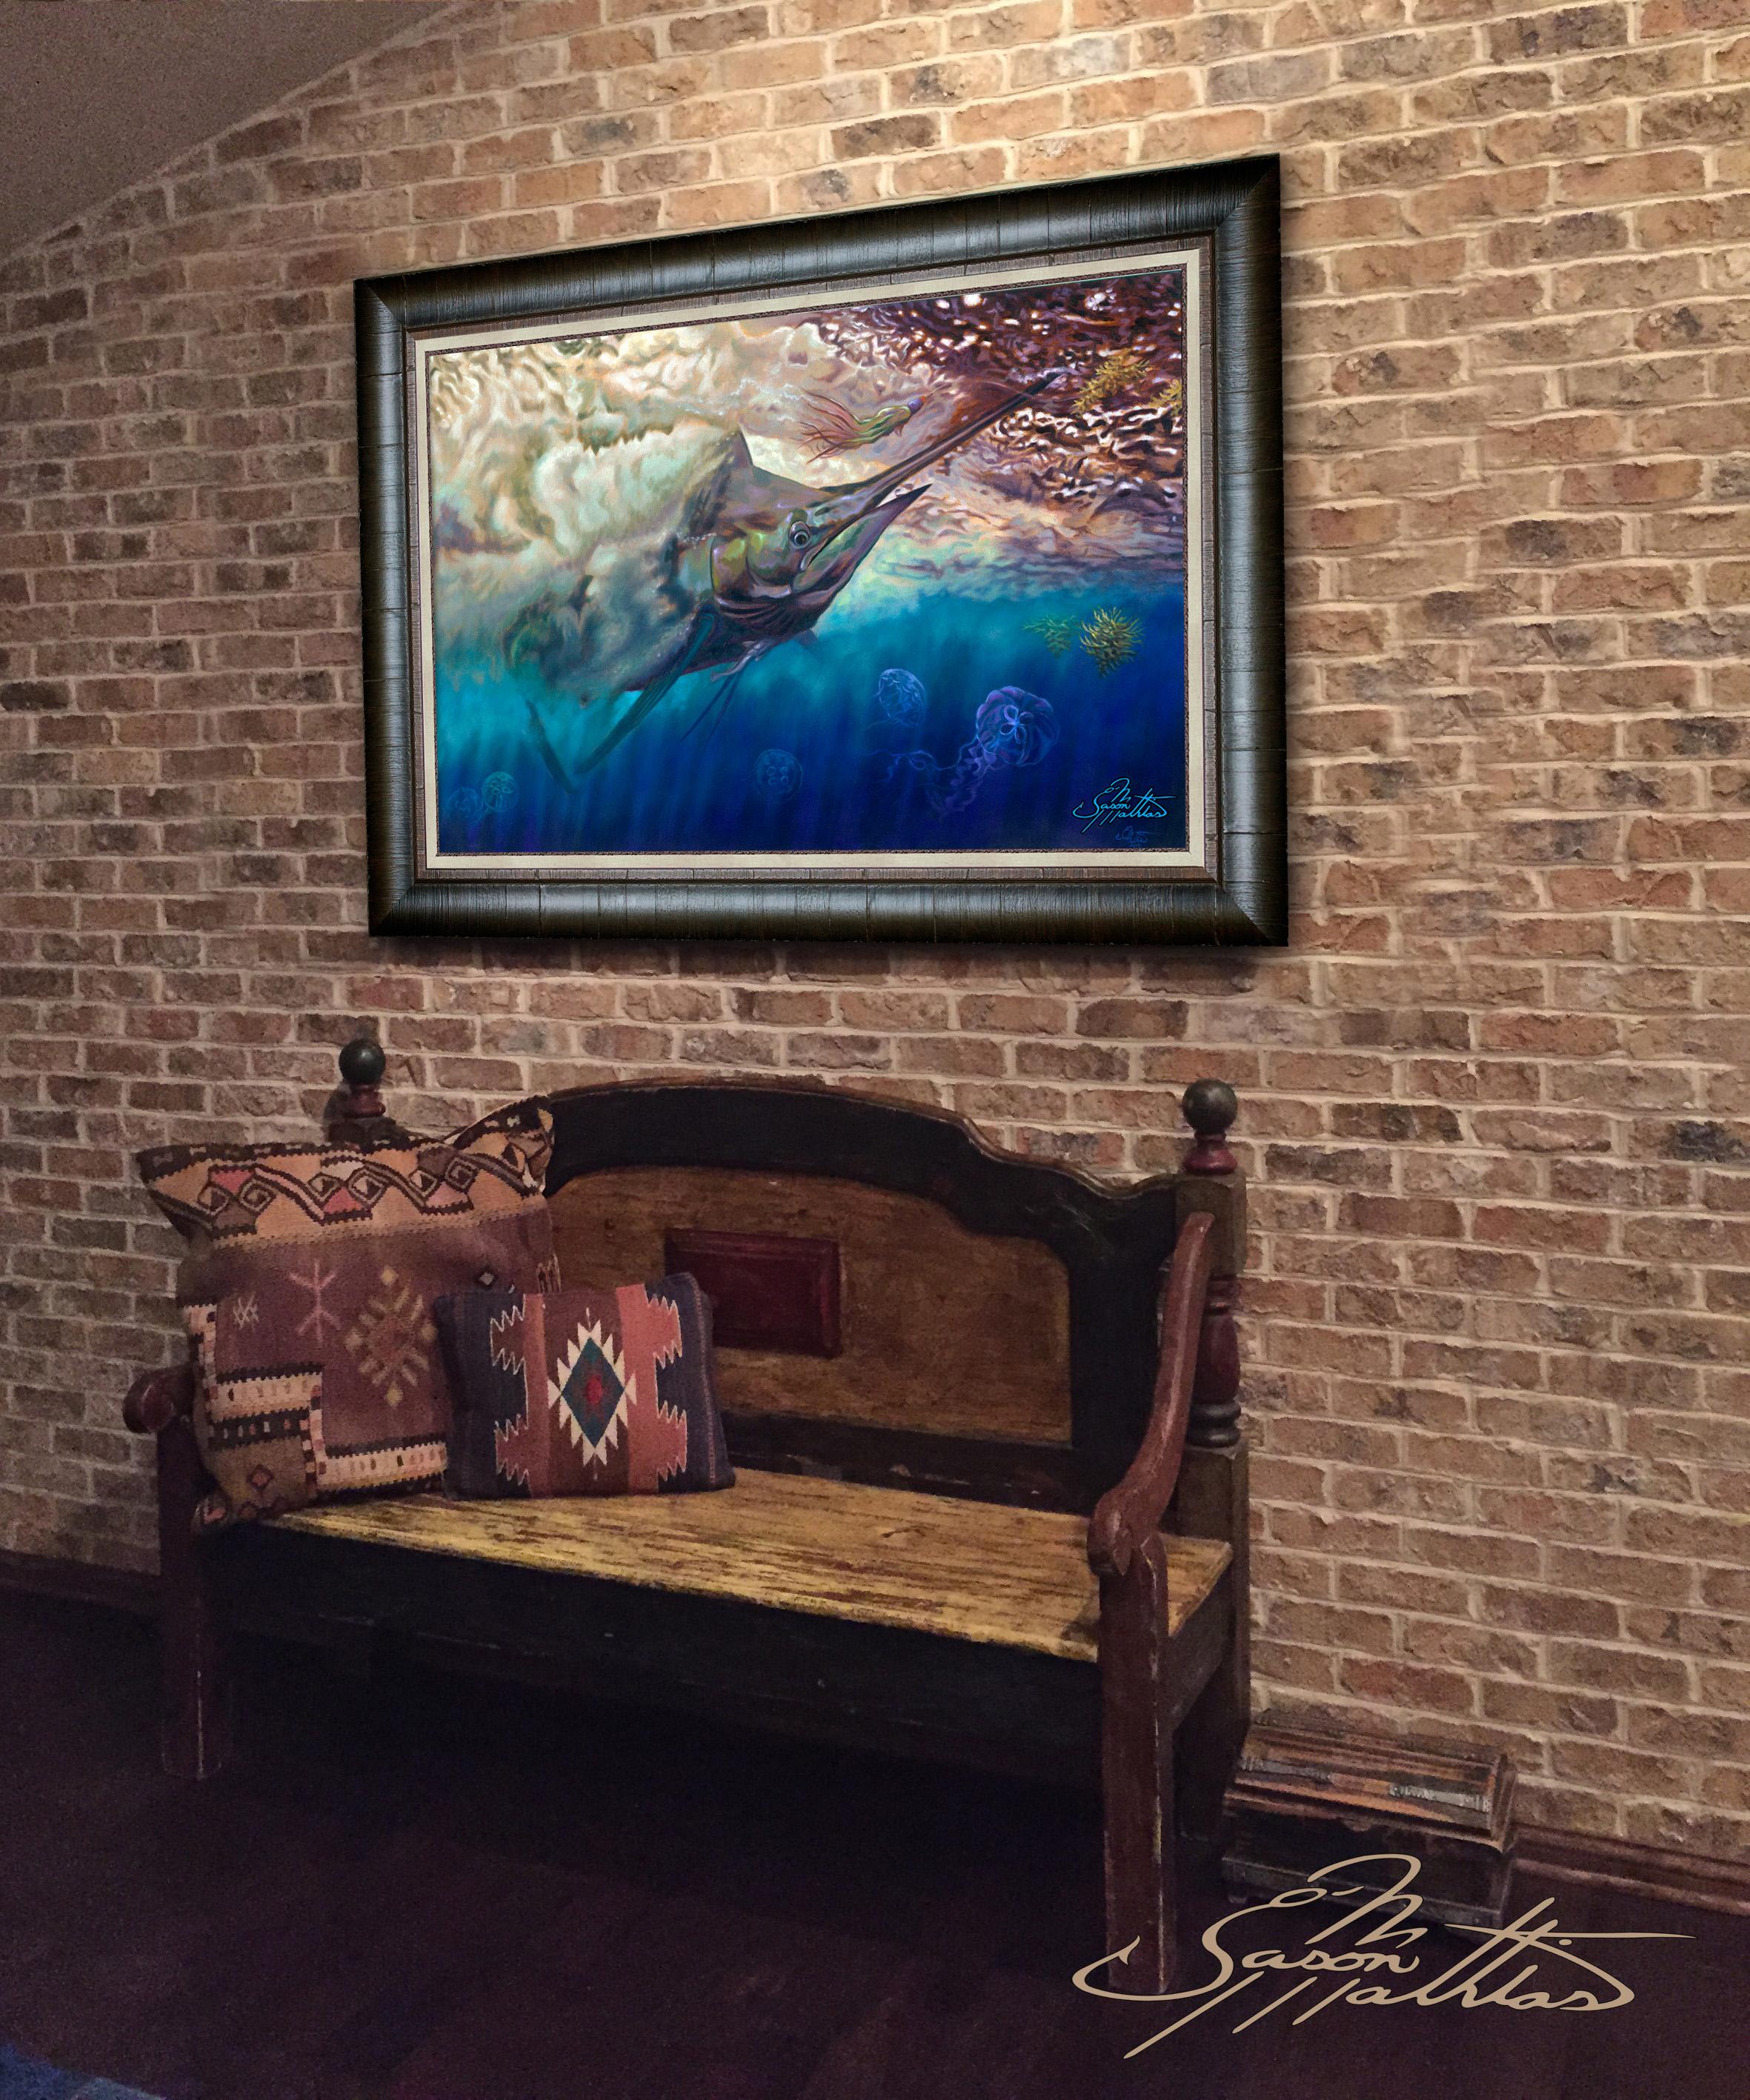 turbulence-blue-marlin-decor-art-jason-mathias.jpg